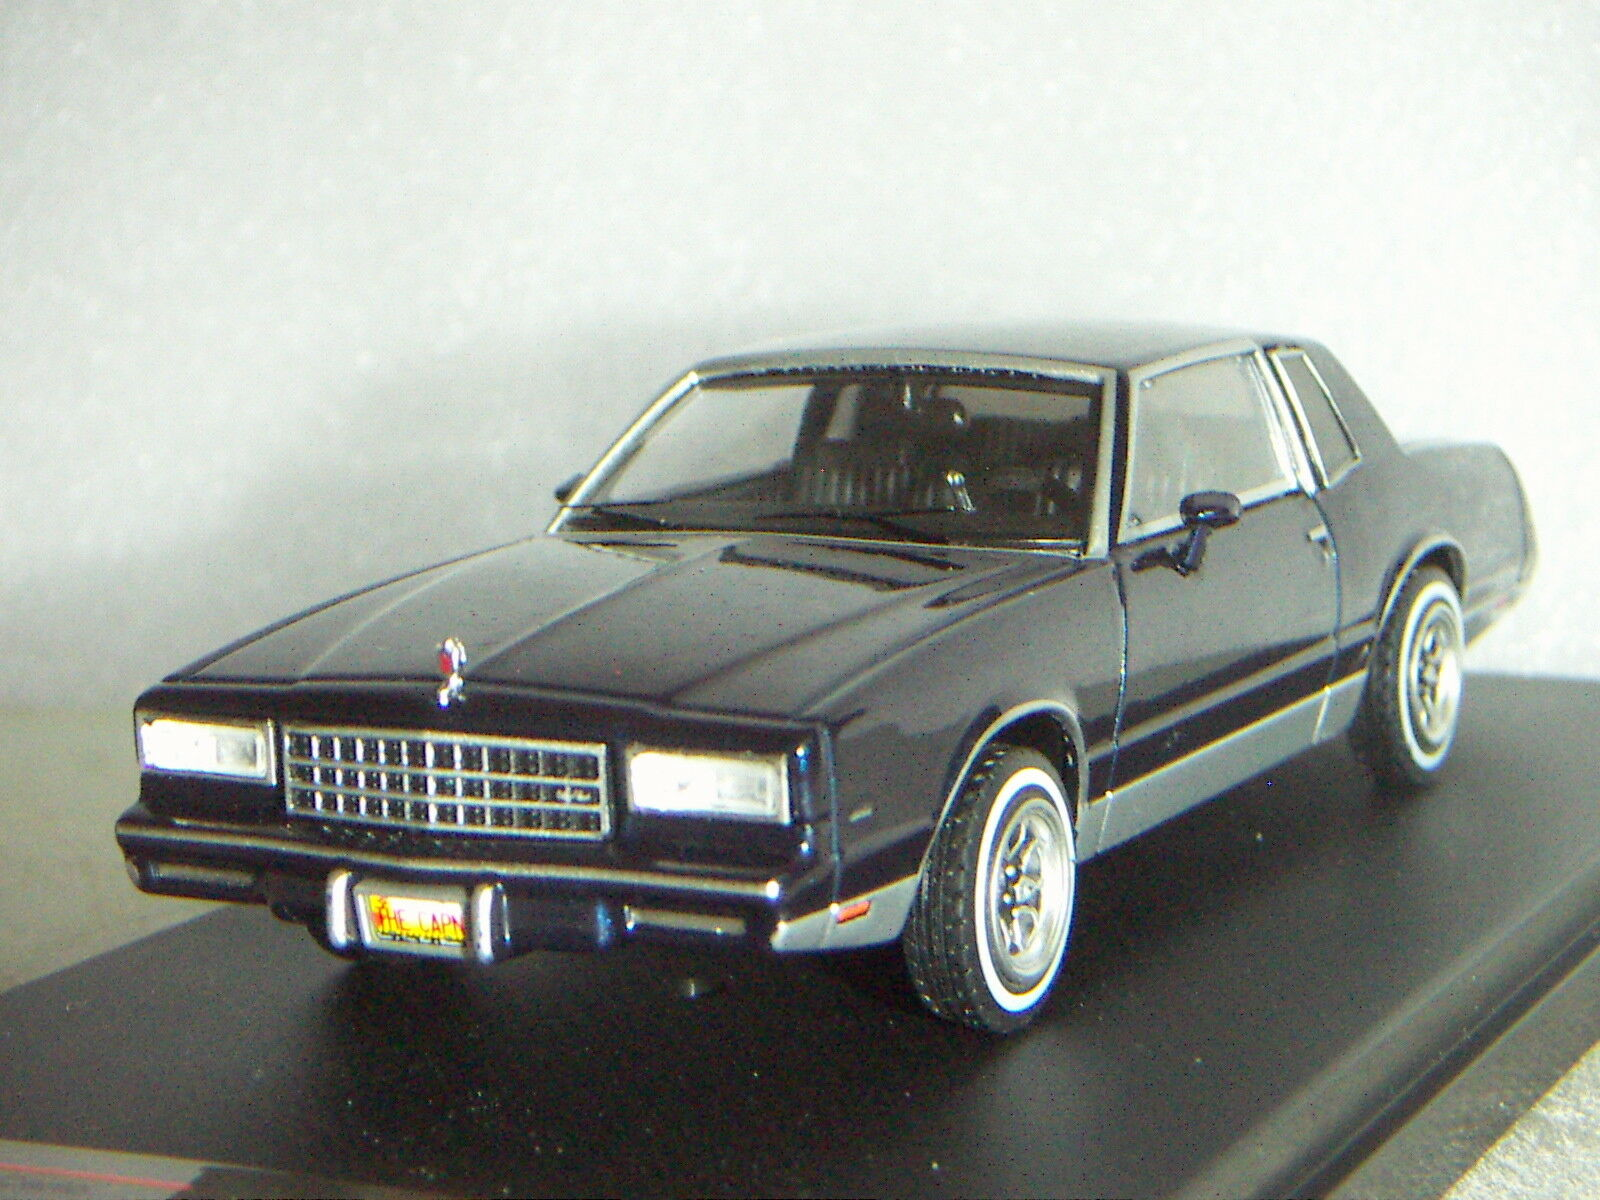 CHEVROLET MONTECARLO 1981 - PREMIUM X au 1 43ème